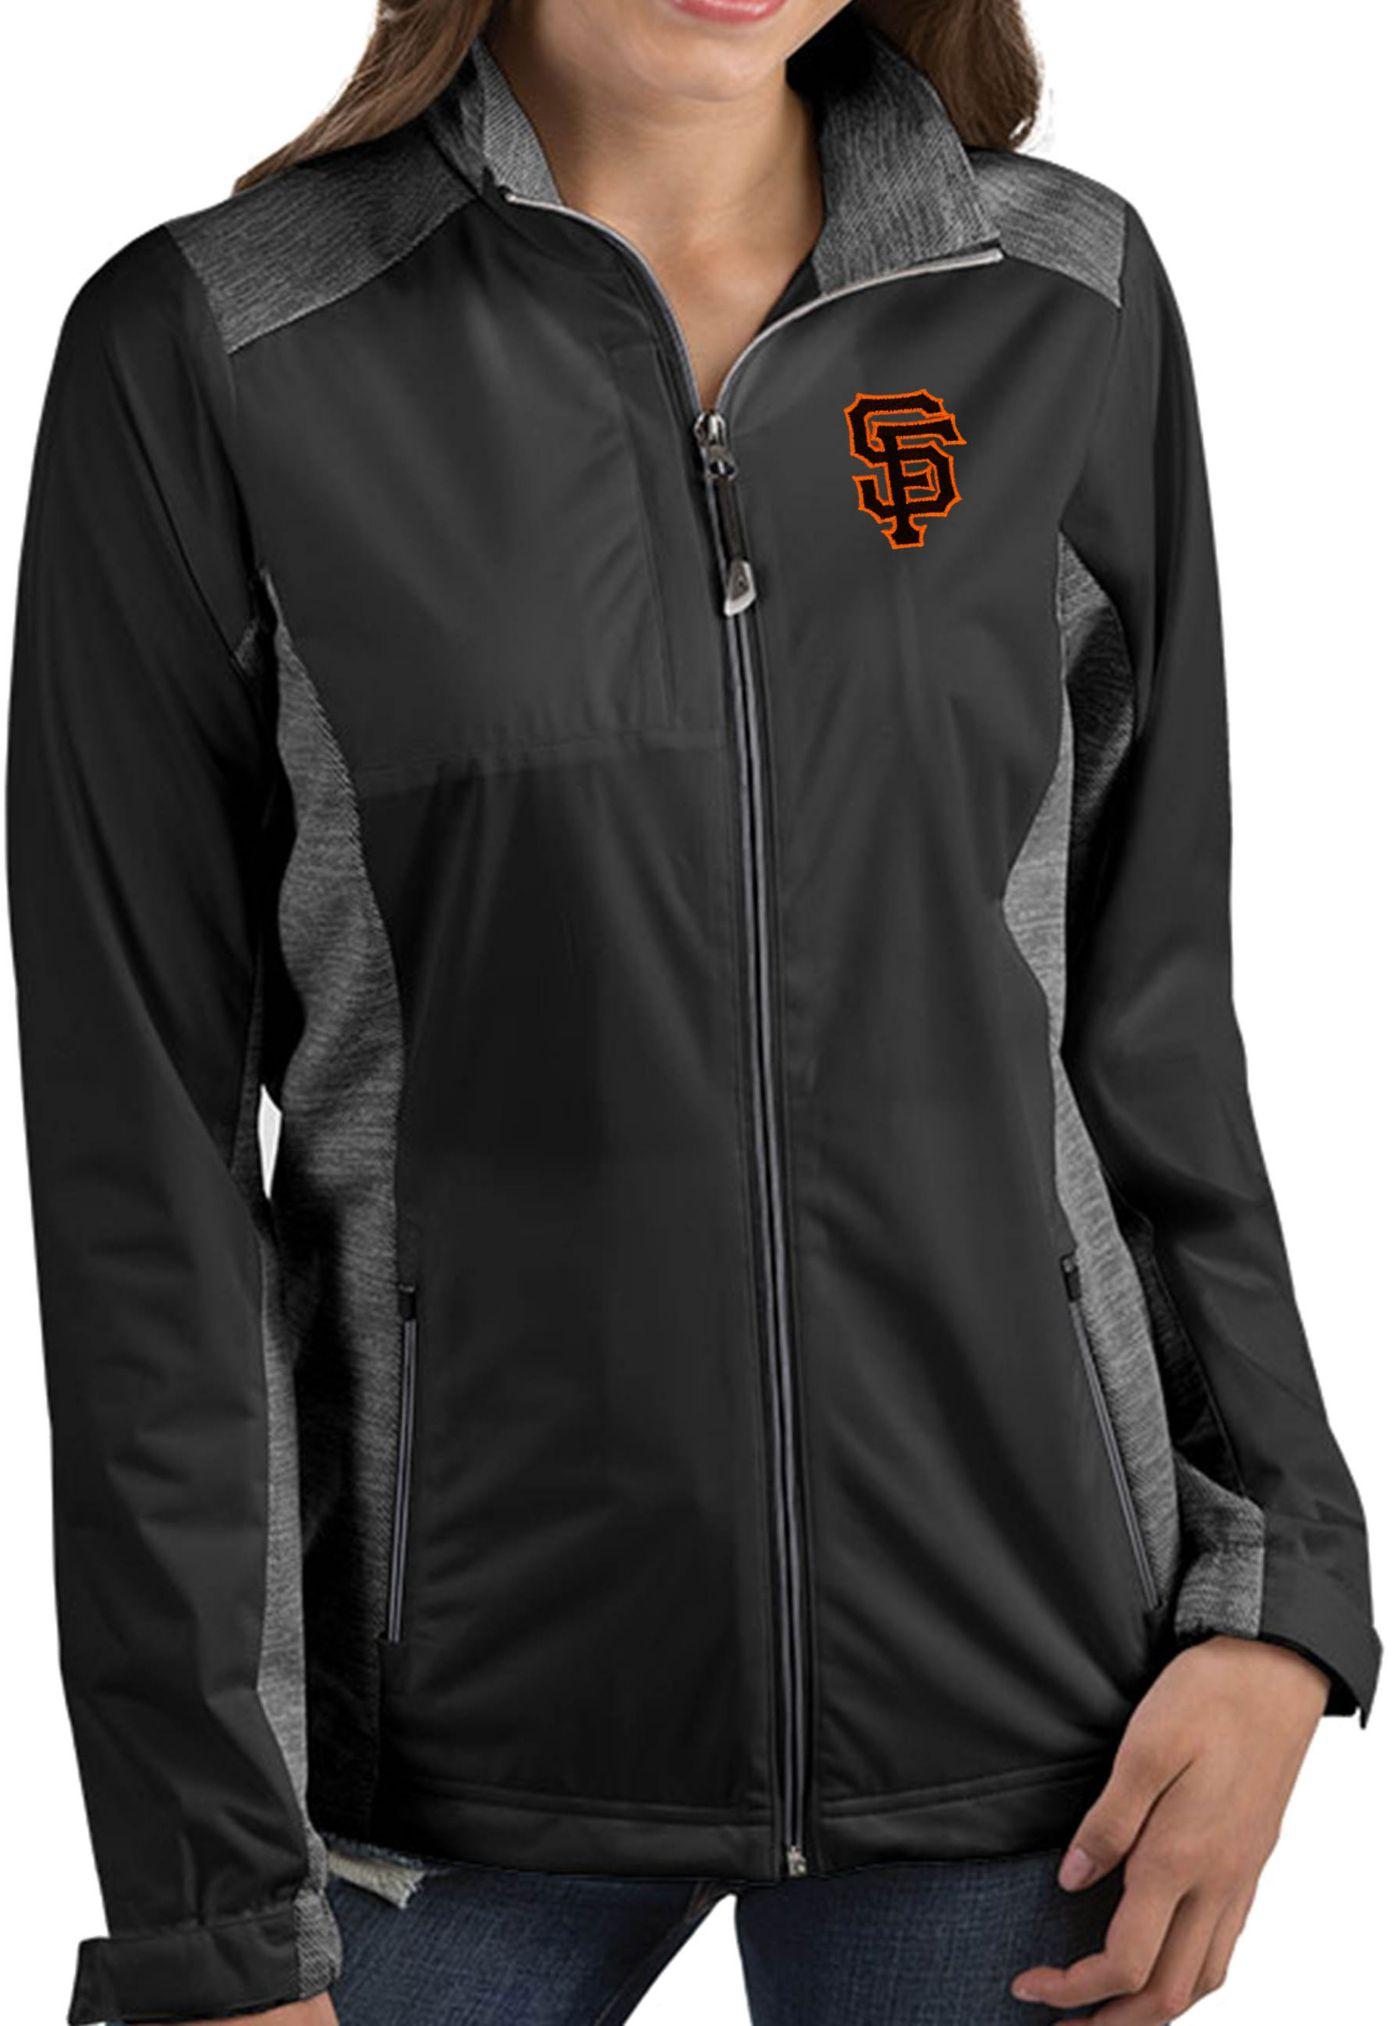 Antigua Women's San Francisco Giants Revolve Black Full-Zip Jacket